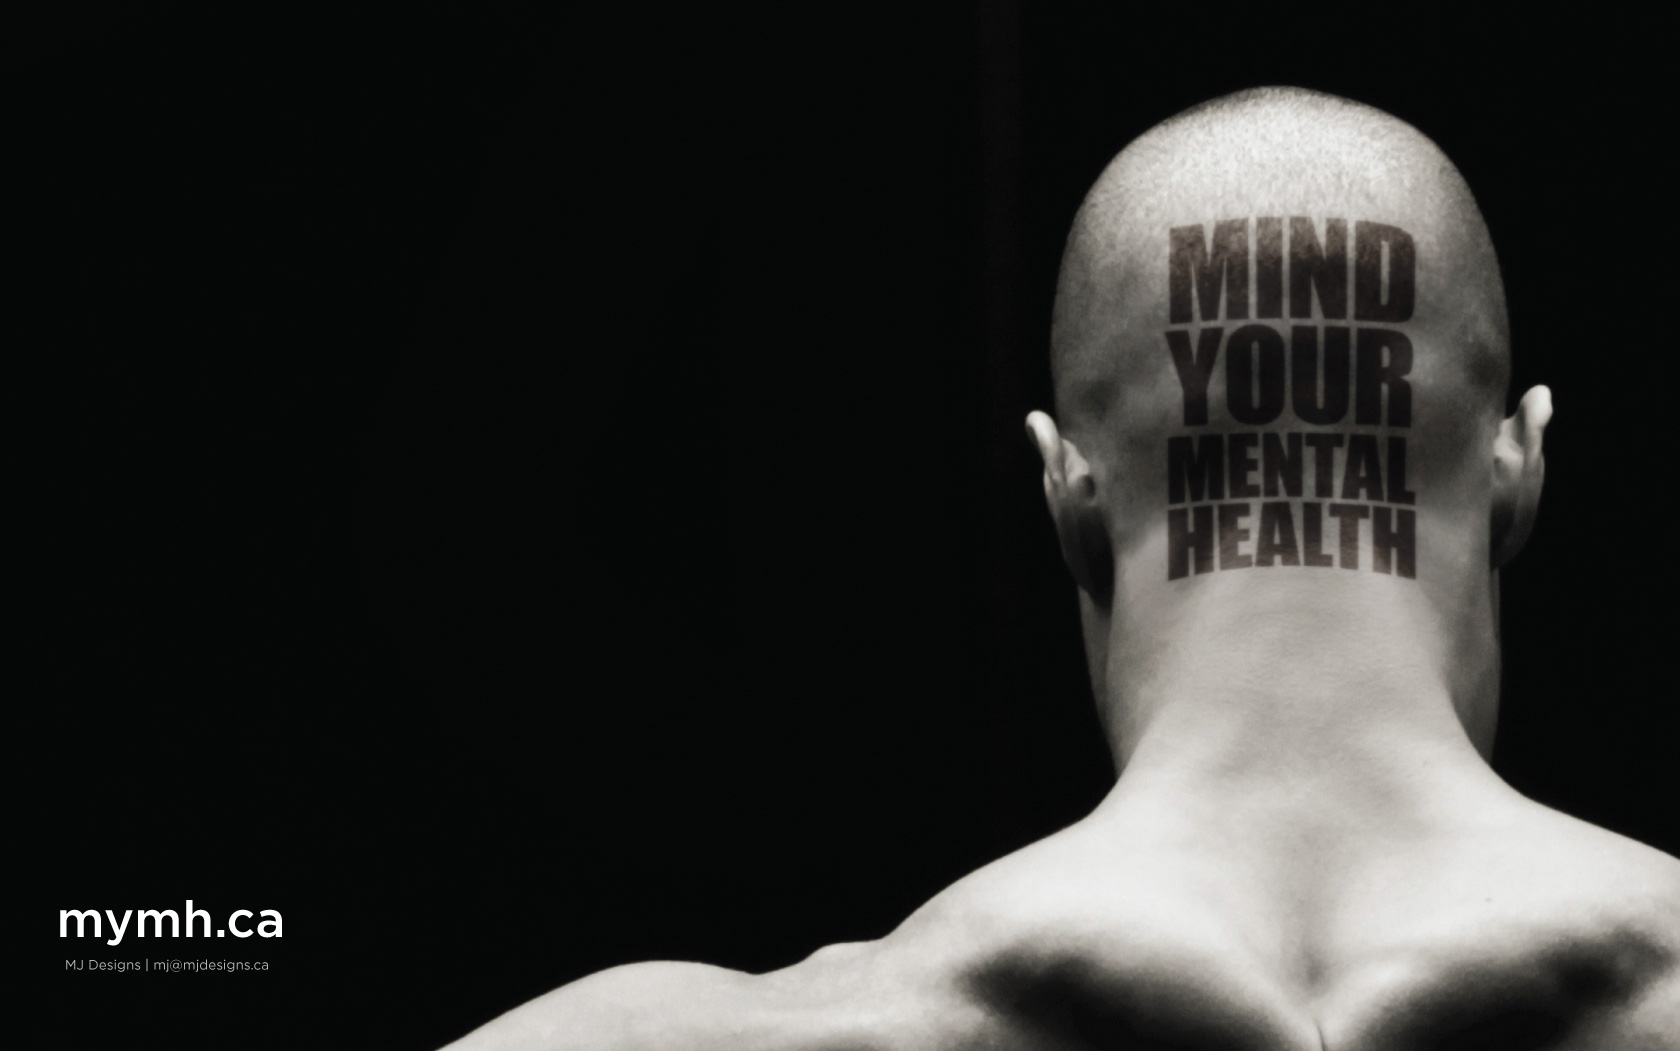 Health Wallpaper Wallpaper   mind your mental 1680x1051